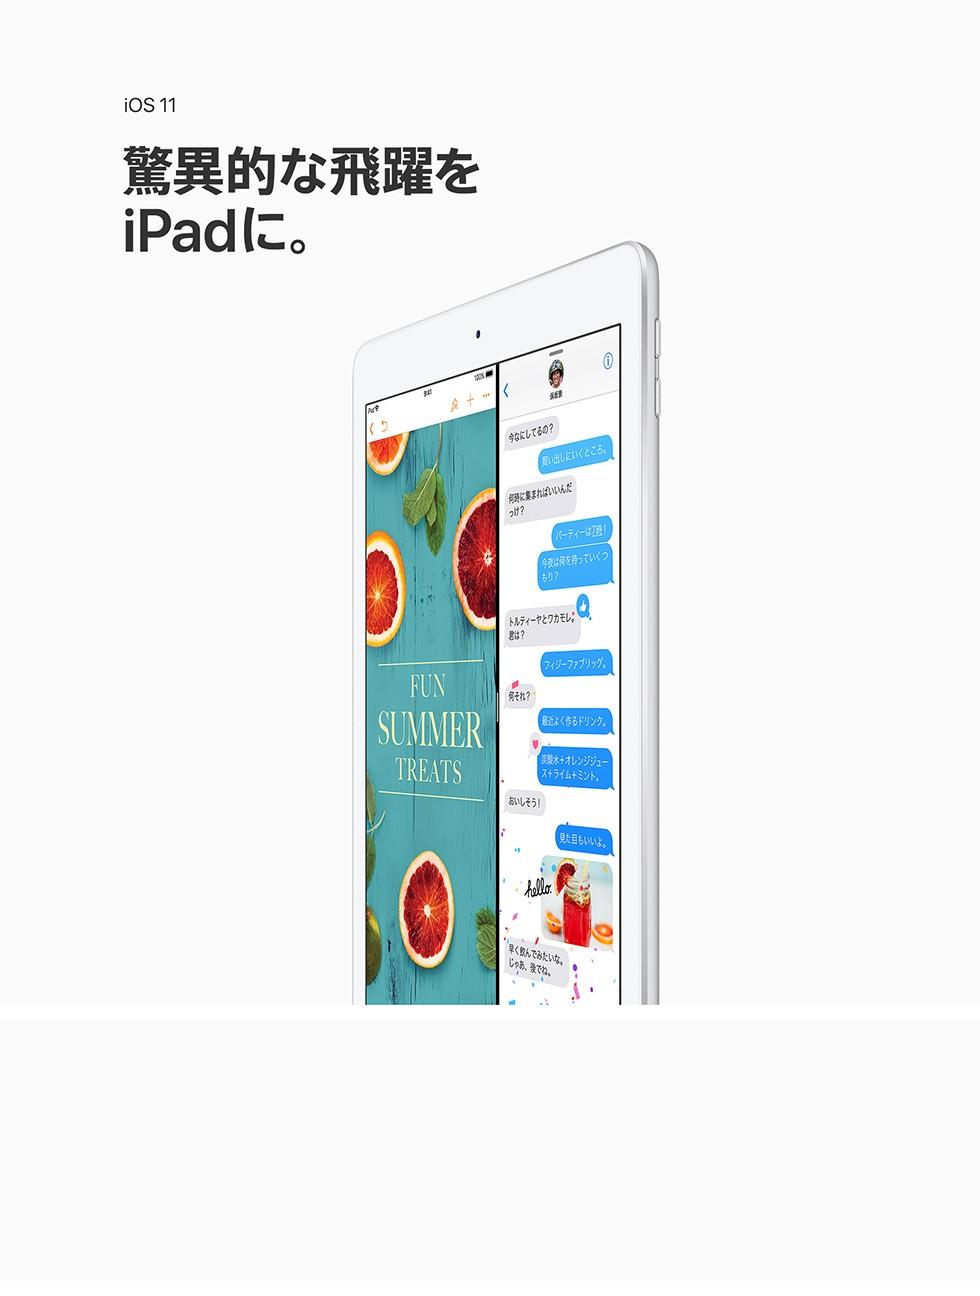 iOS 11 驚異的な飛躍を iPadに。